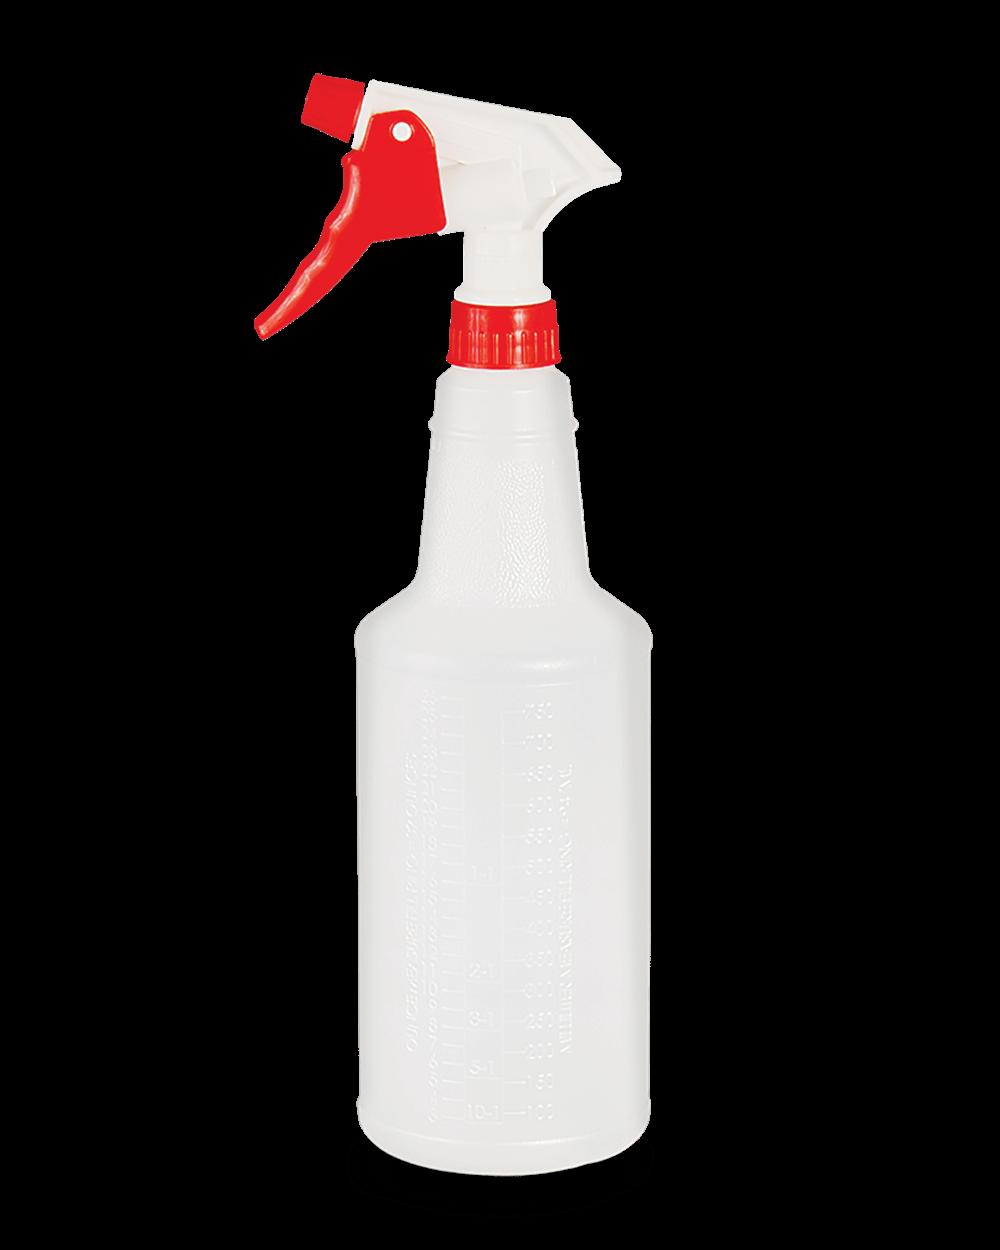 Trigger-Sprayer